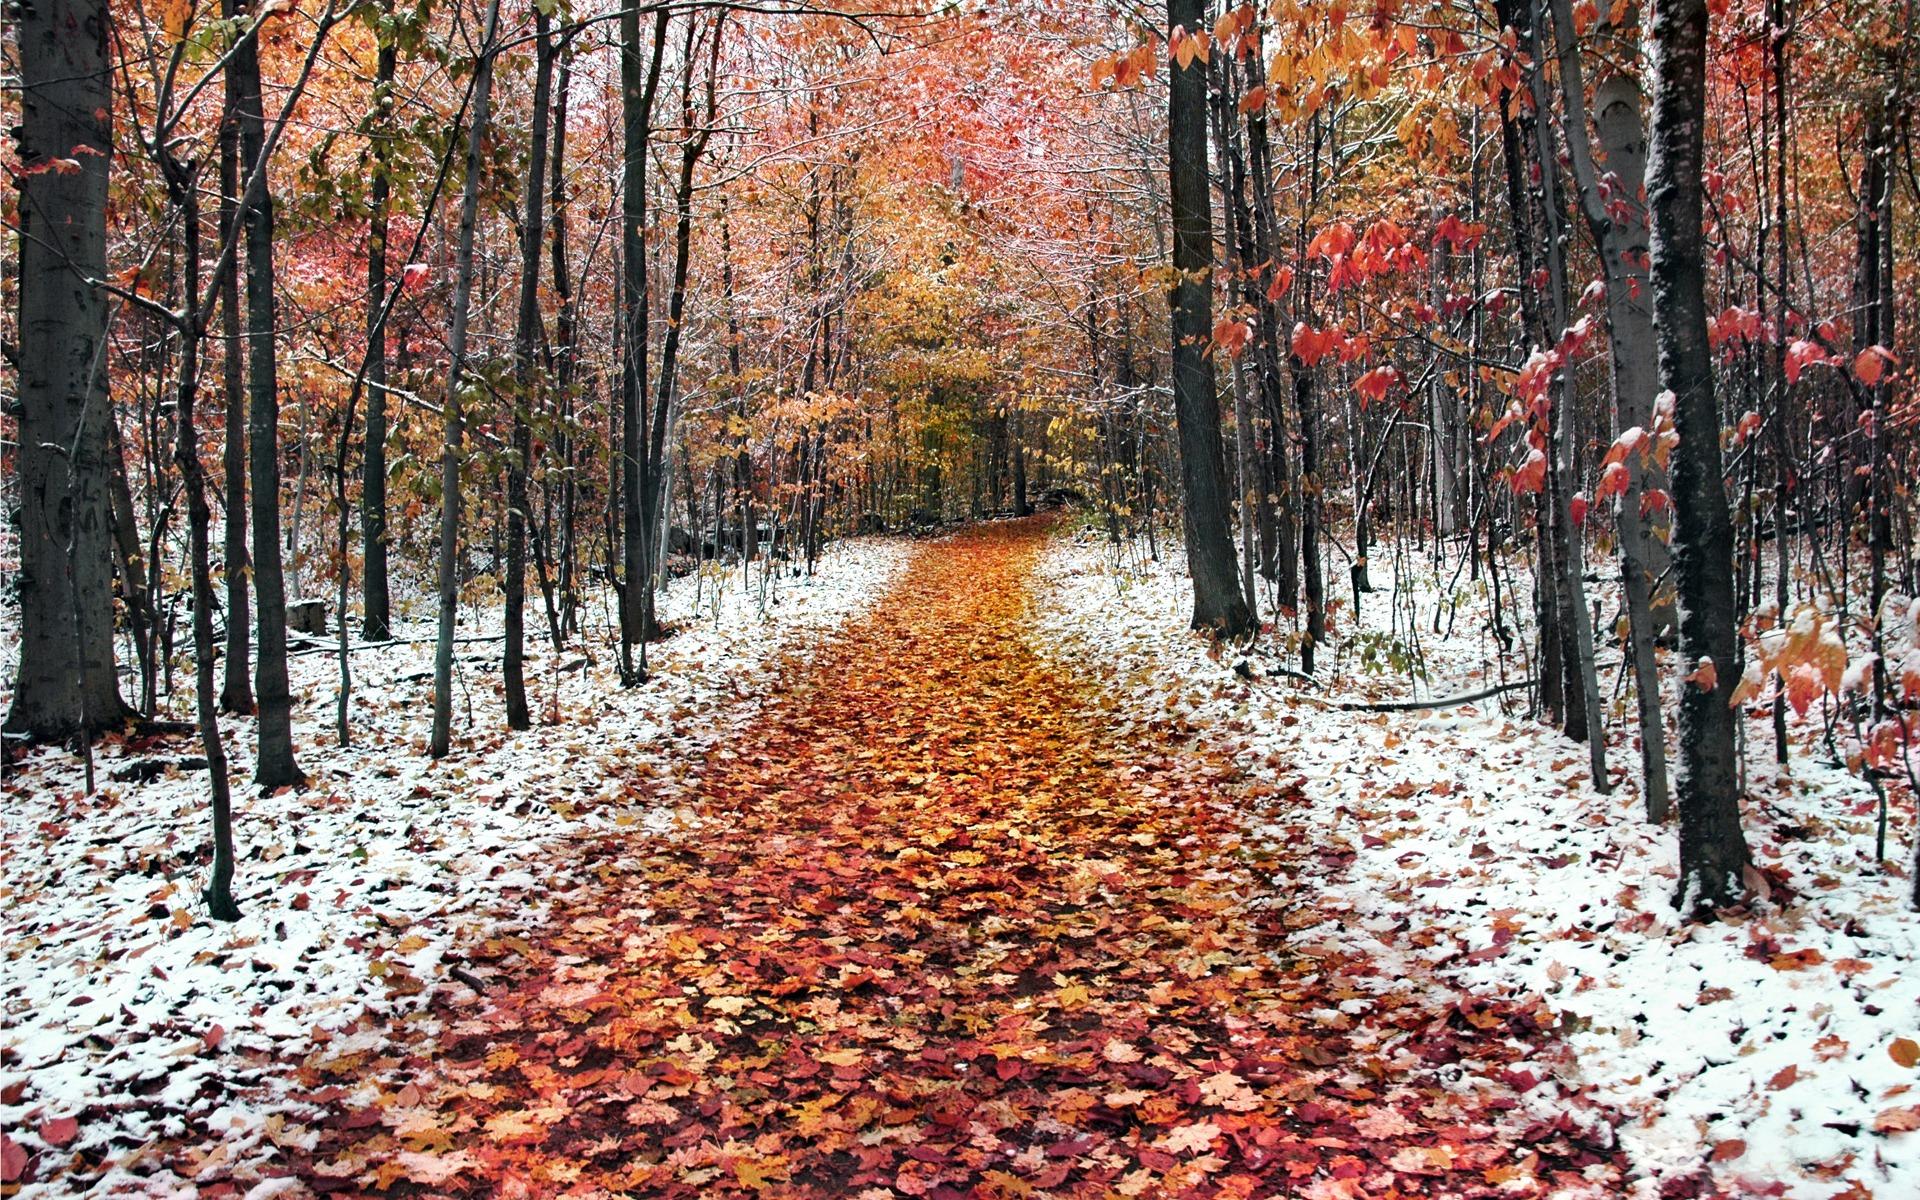 frosty wallpaper autumn nature